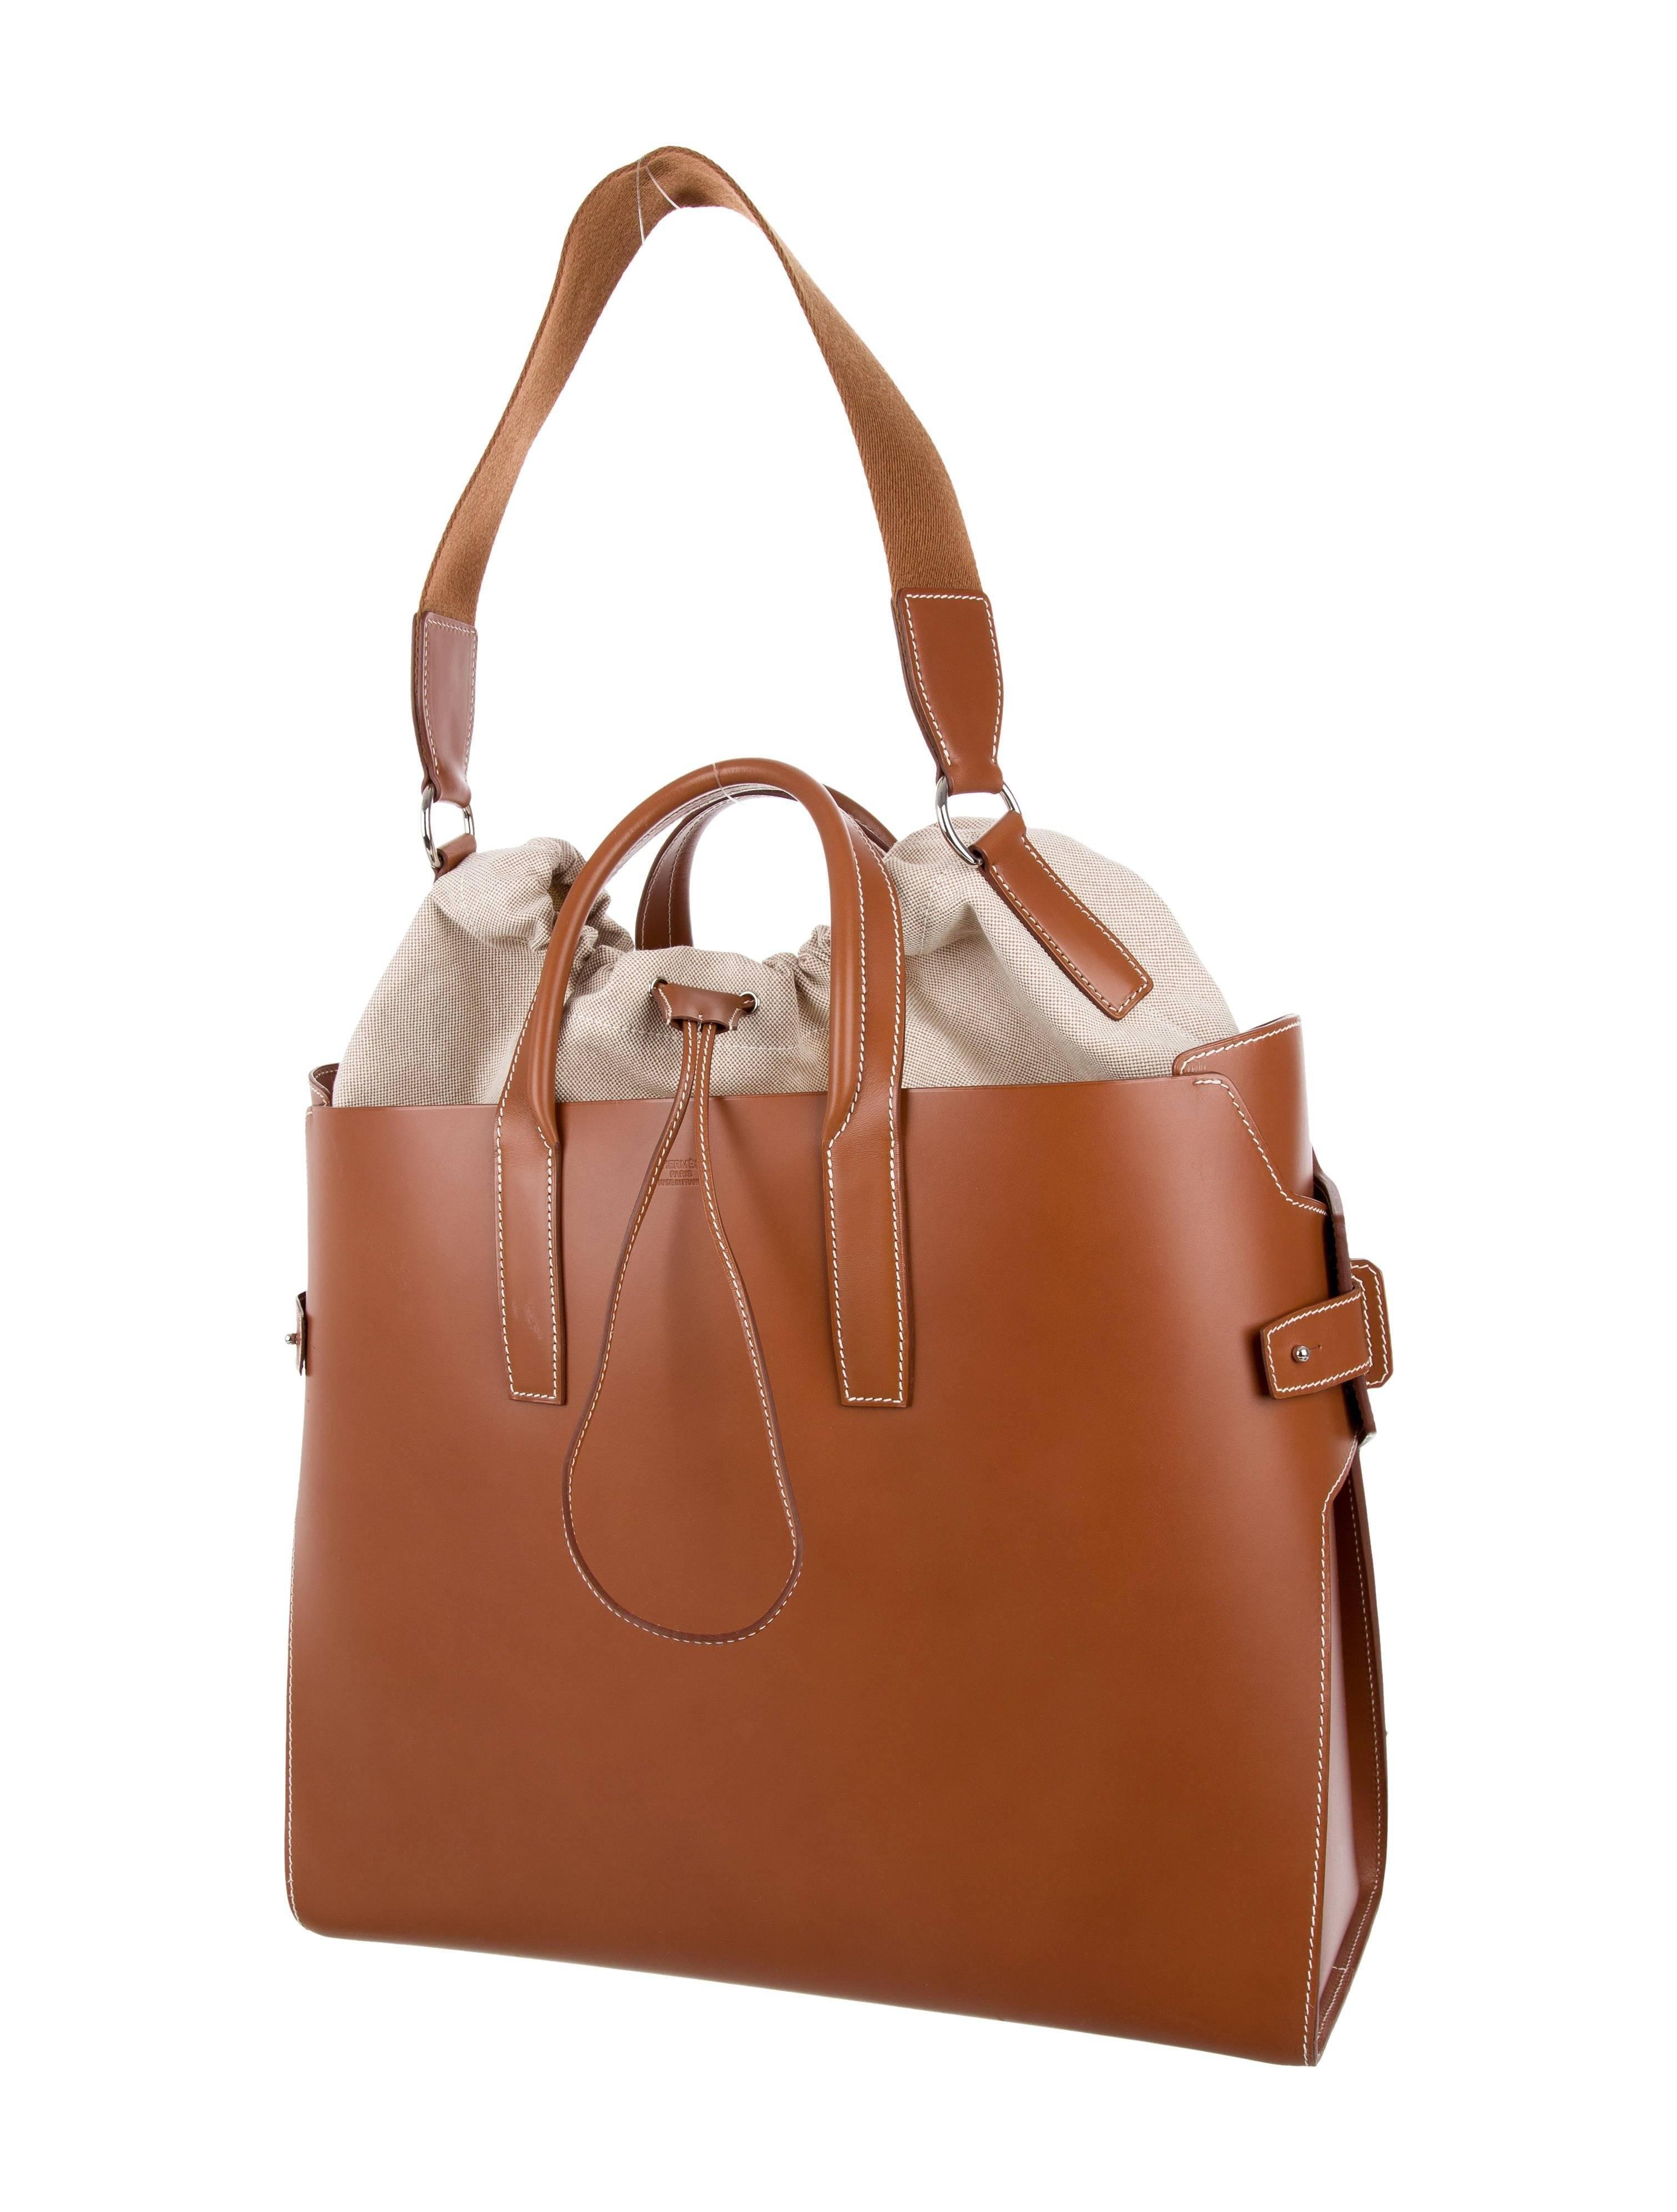 ca50e26262df Hermes Runway Leather Cognac Men s Carryall Duffle Travel Weekender Tote Bag  at 1stdibs